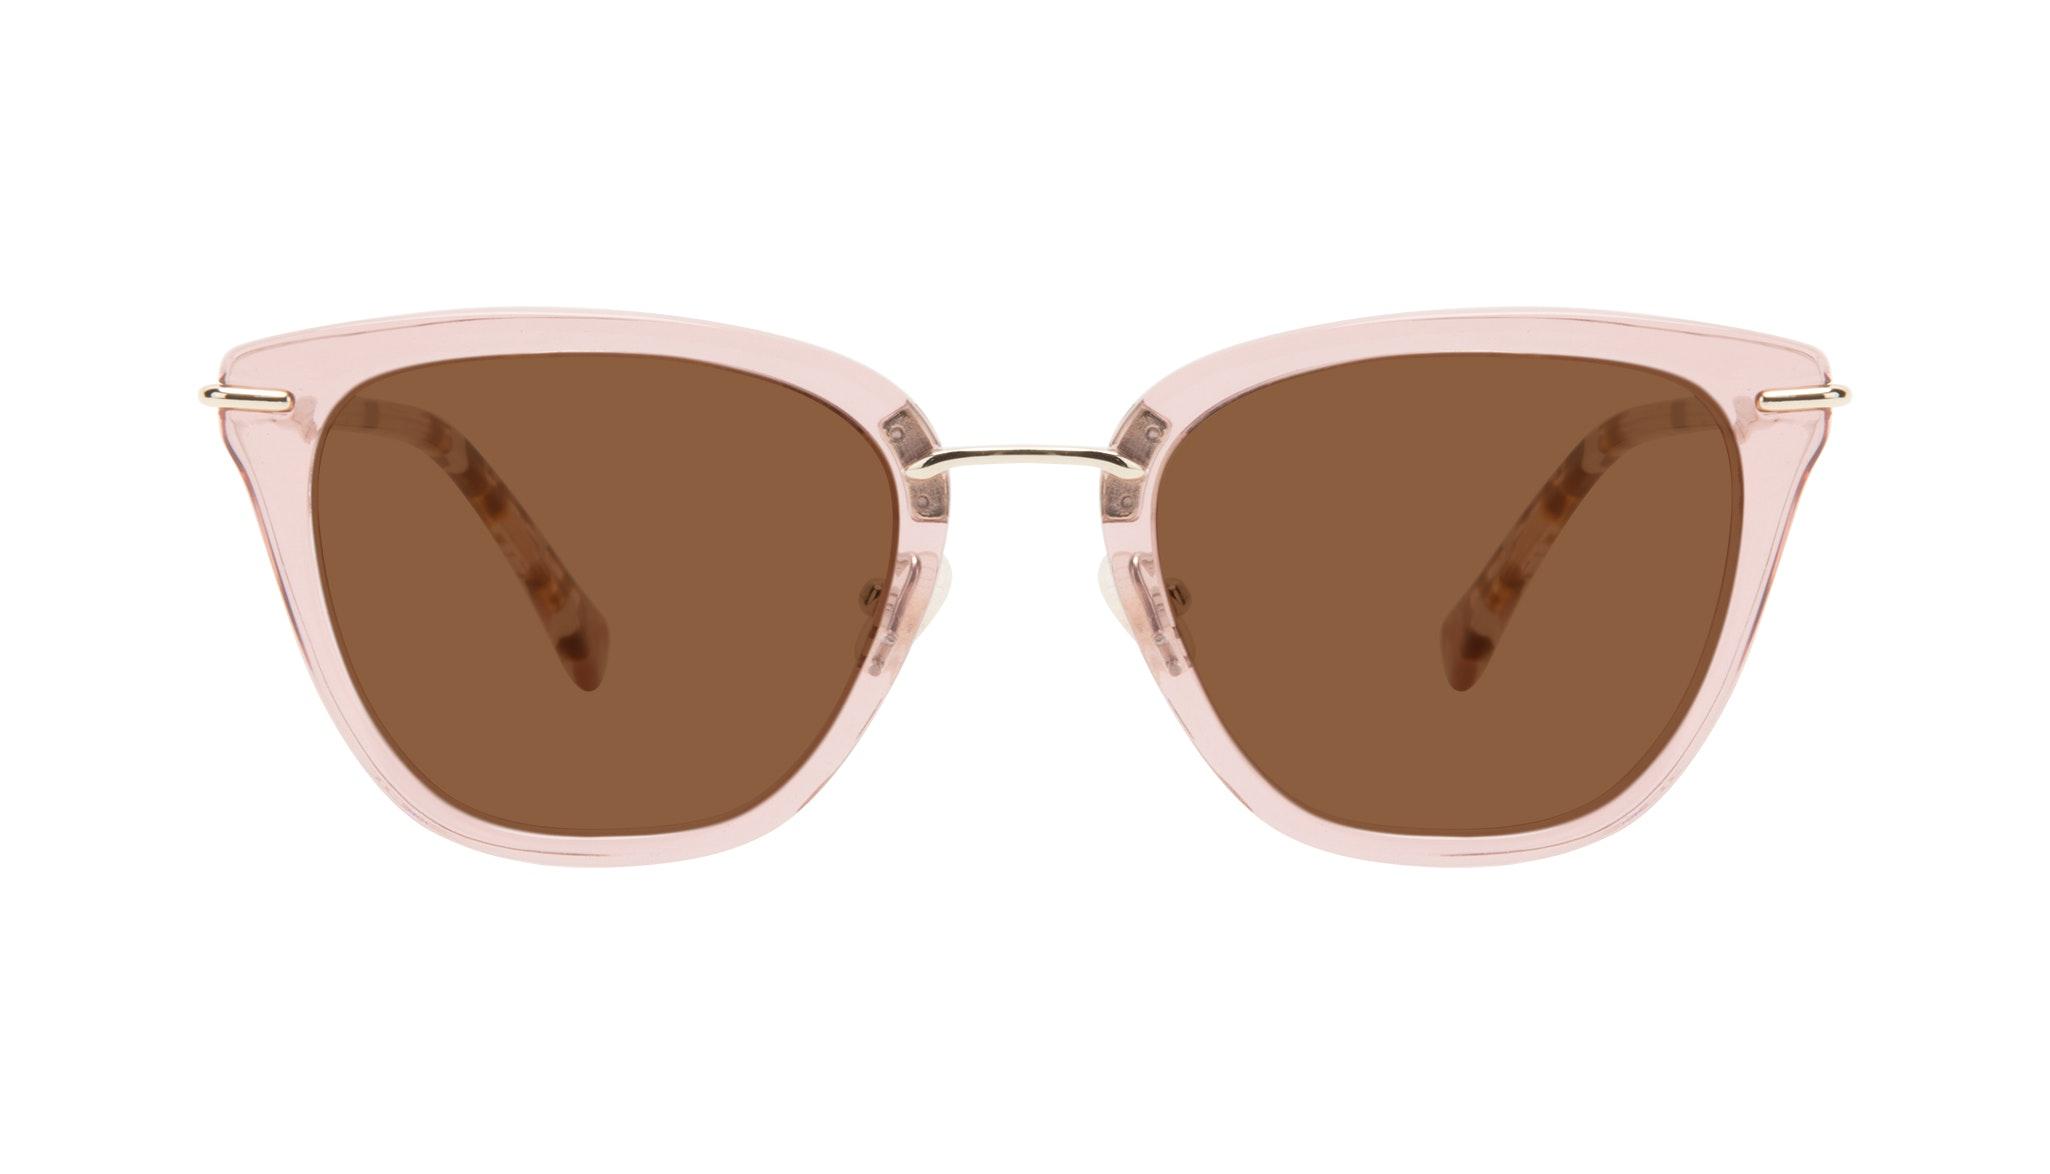 Affordable Fashion Glasses Square Sunglasses Women Flirt Rose Front